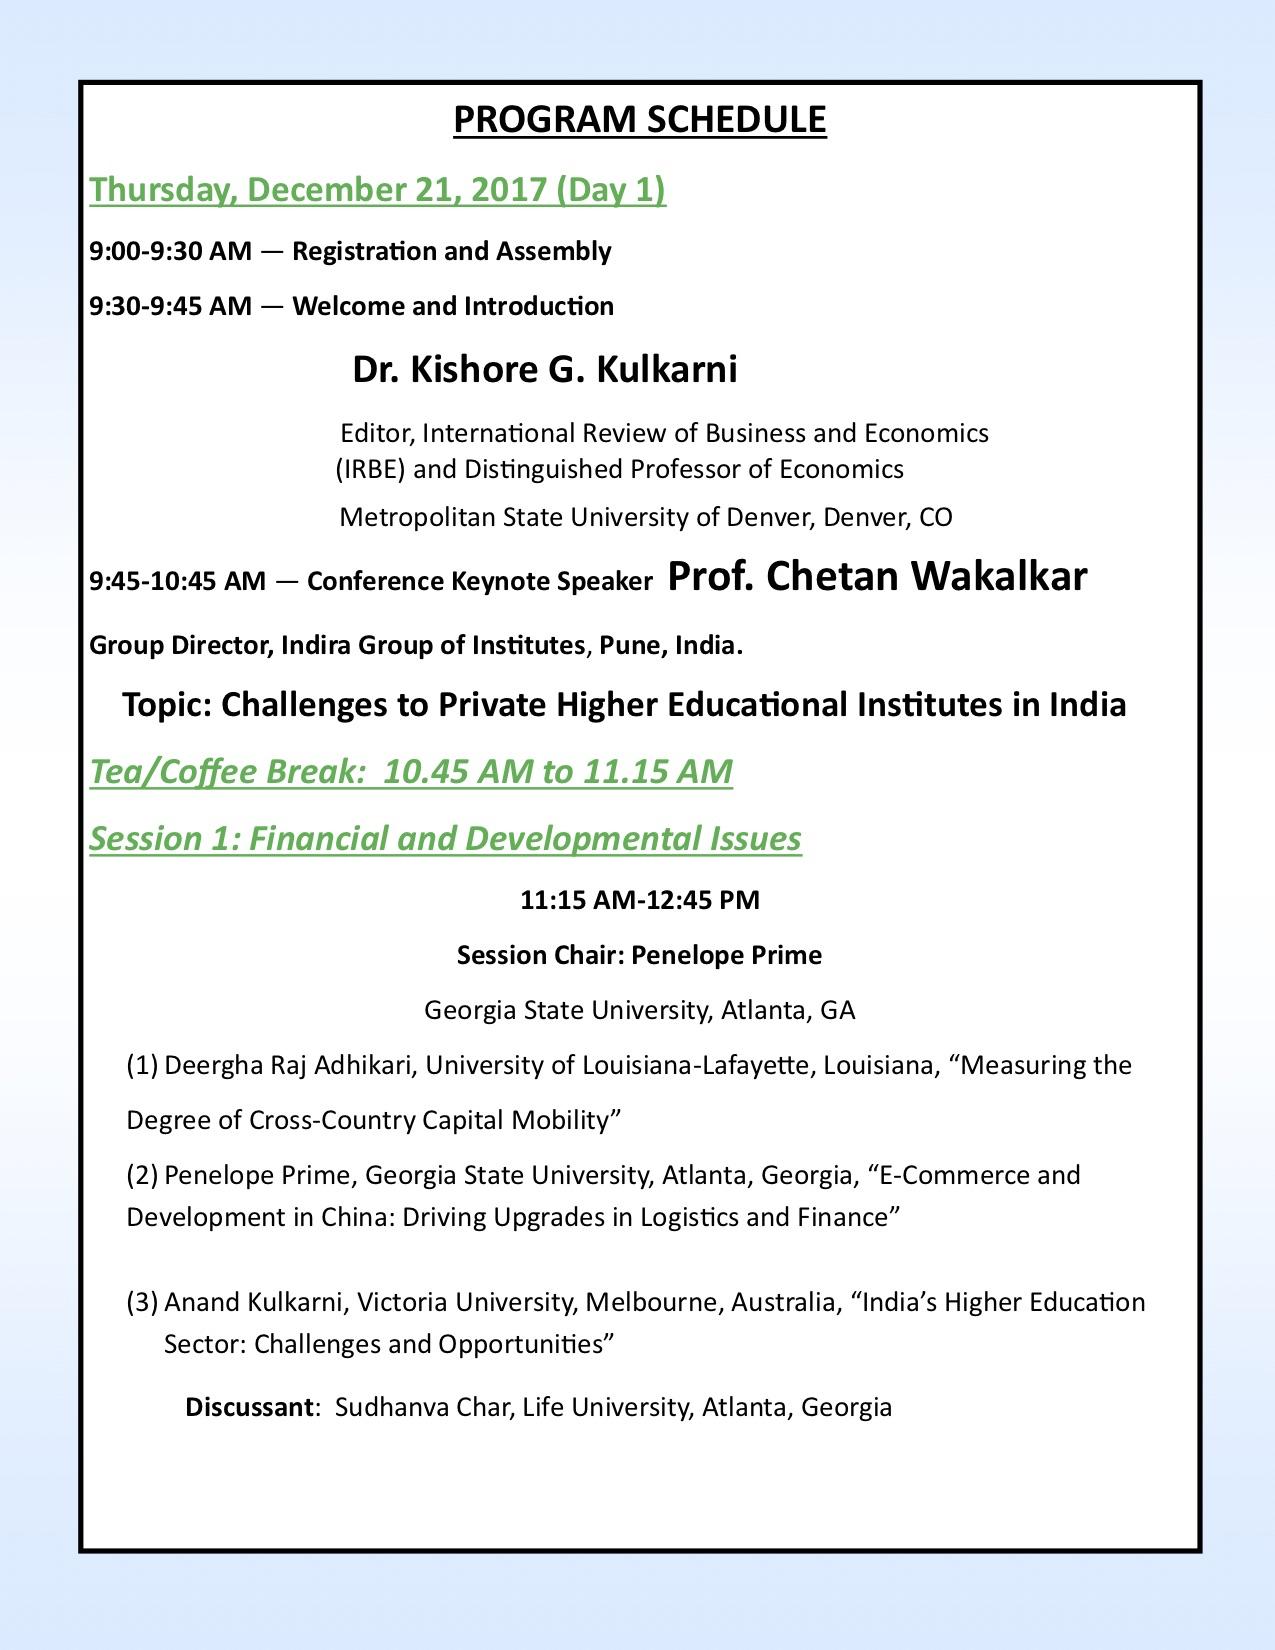 IRBE Conference Brochure 2.jpg